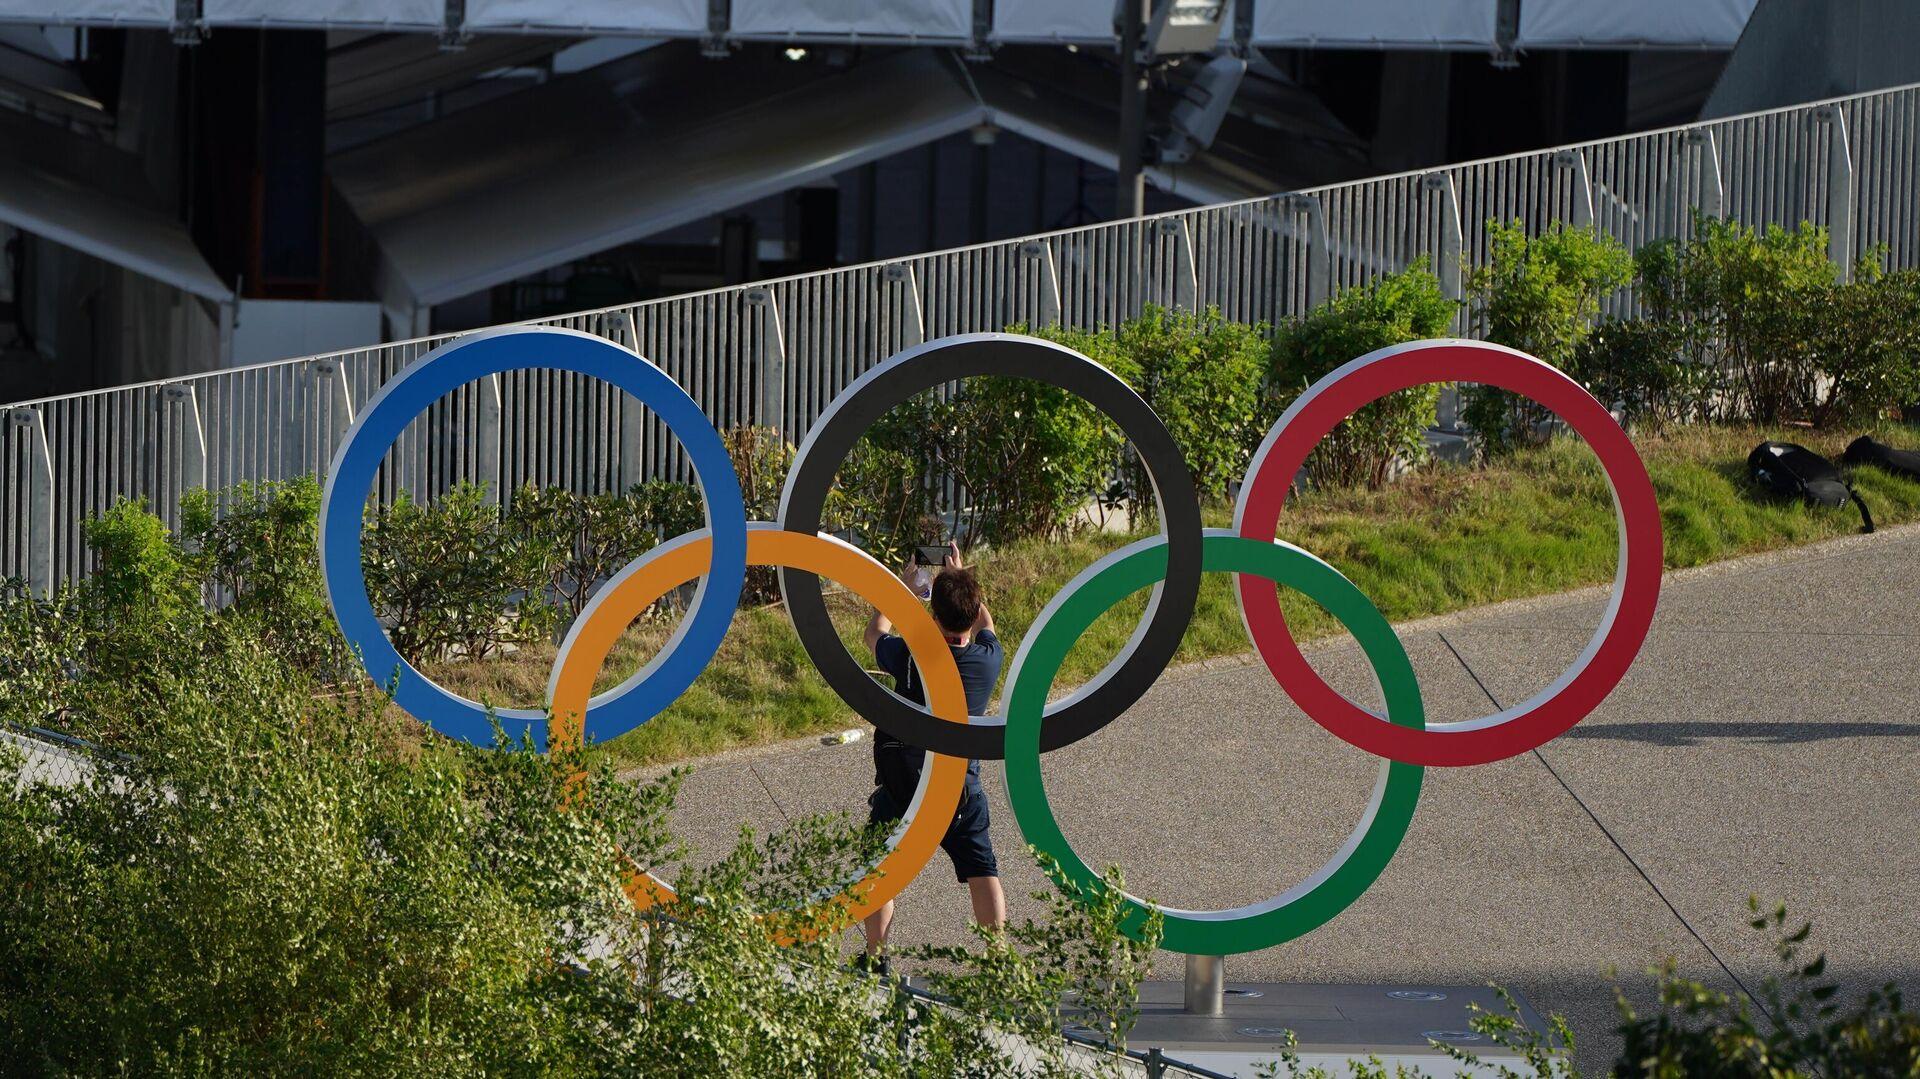 Церемония открытия XXXII летних Олимпийских игр - РИА Новости, 1920, 01.08.2021